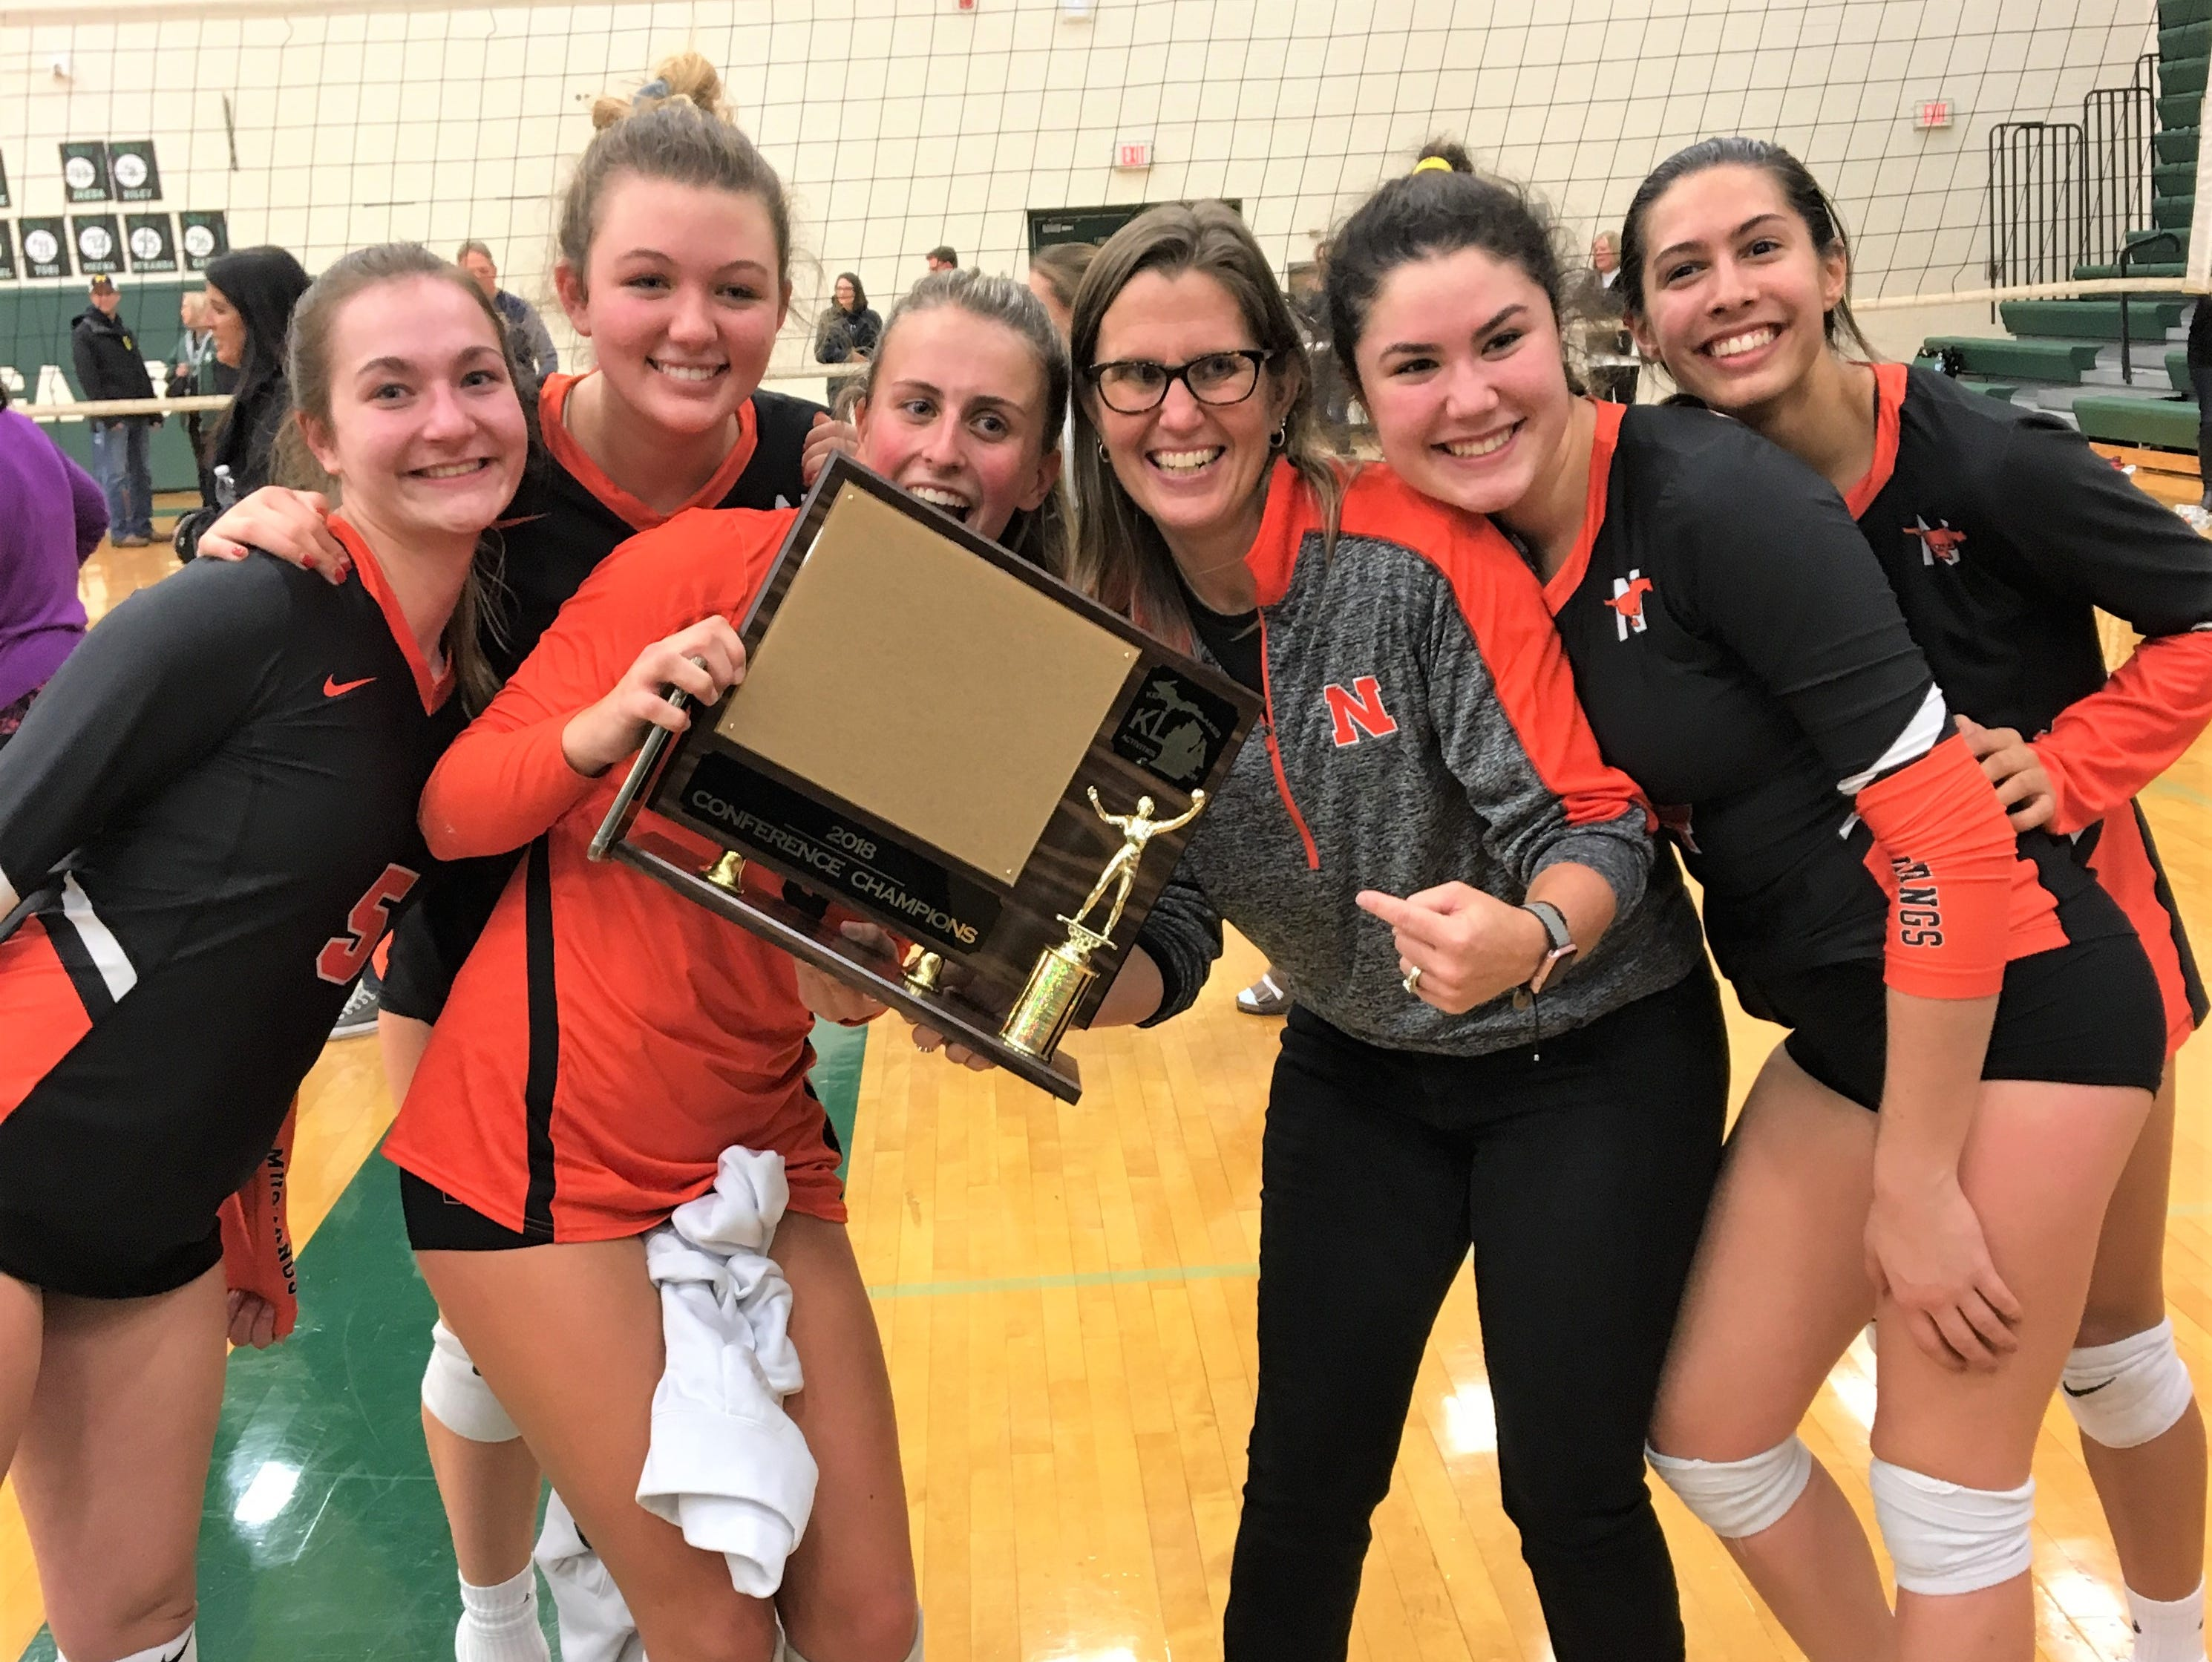 KLAA girls volleyball champ Northville unseats Novi in tourney final